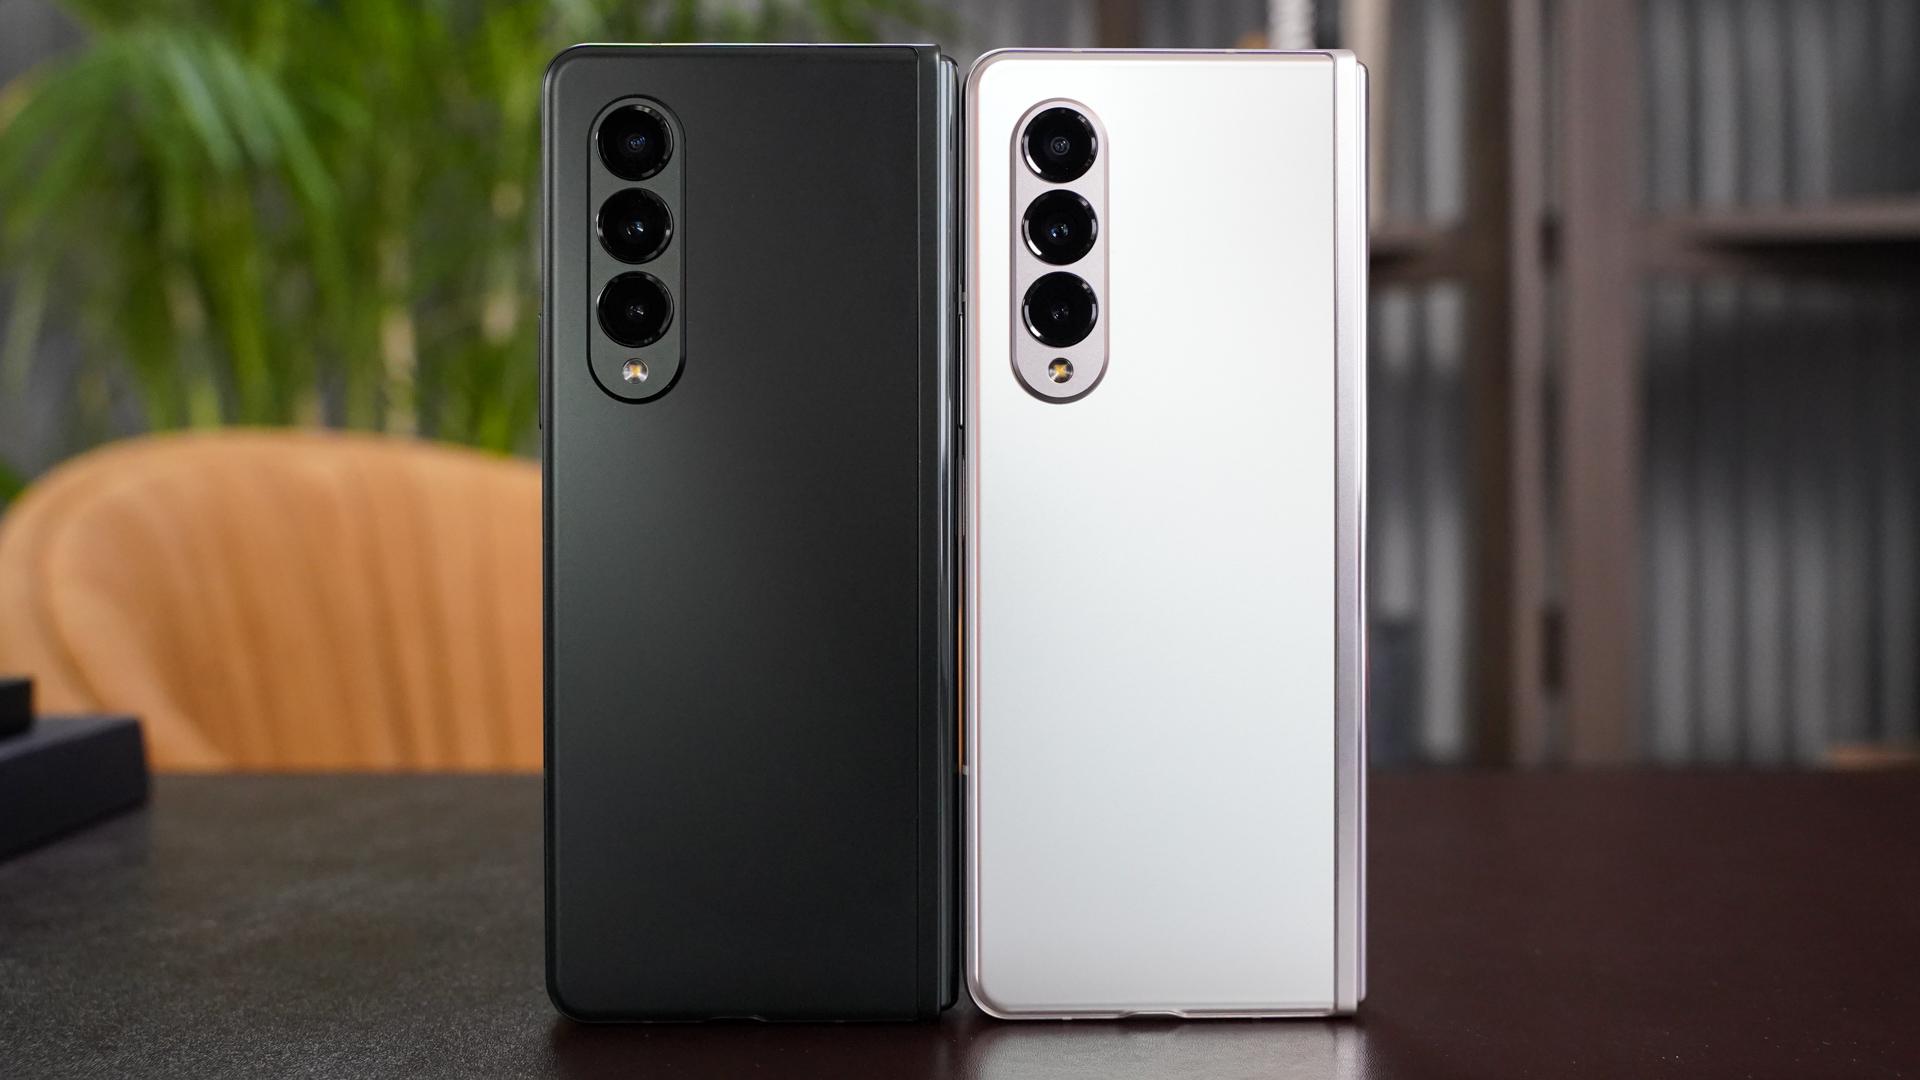 Samsung Galaxy Fold 3 in black and silver